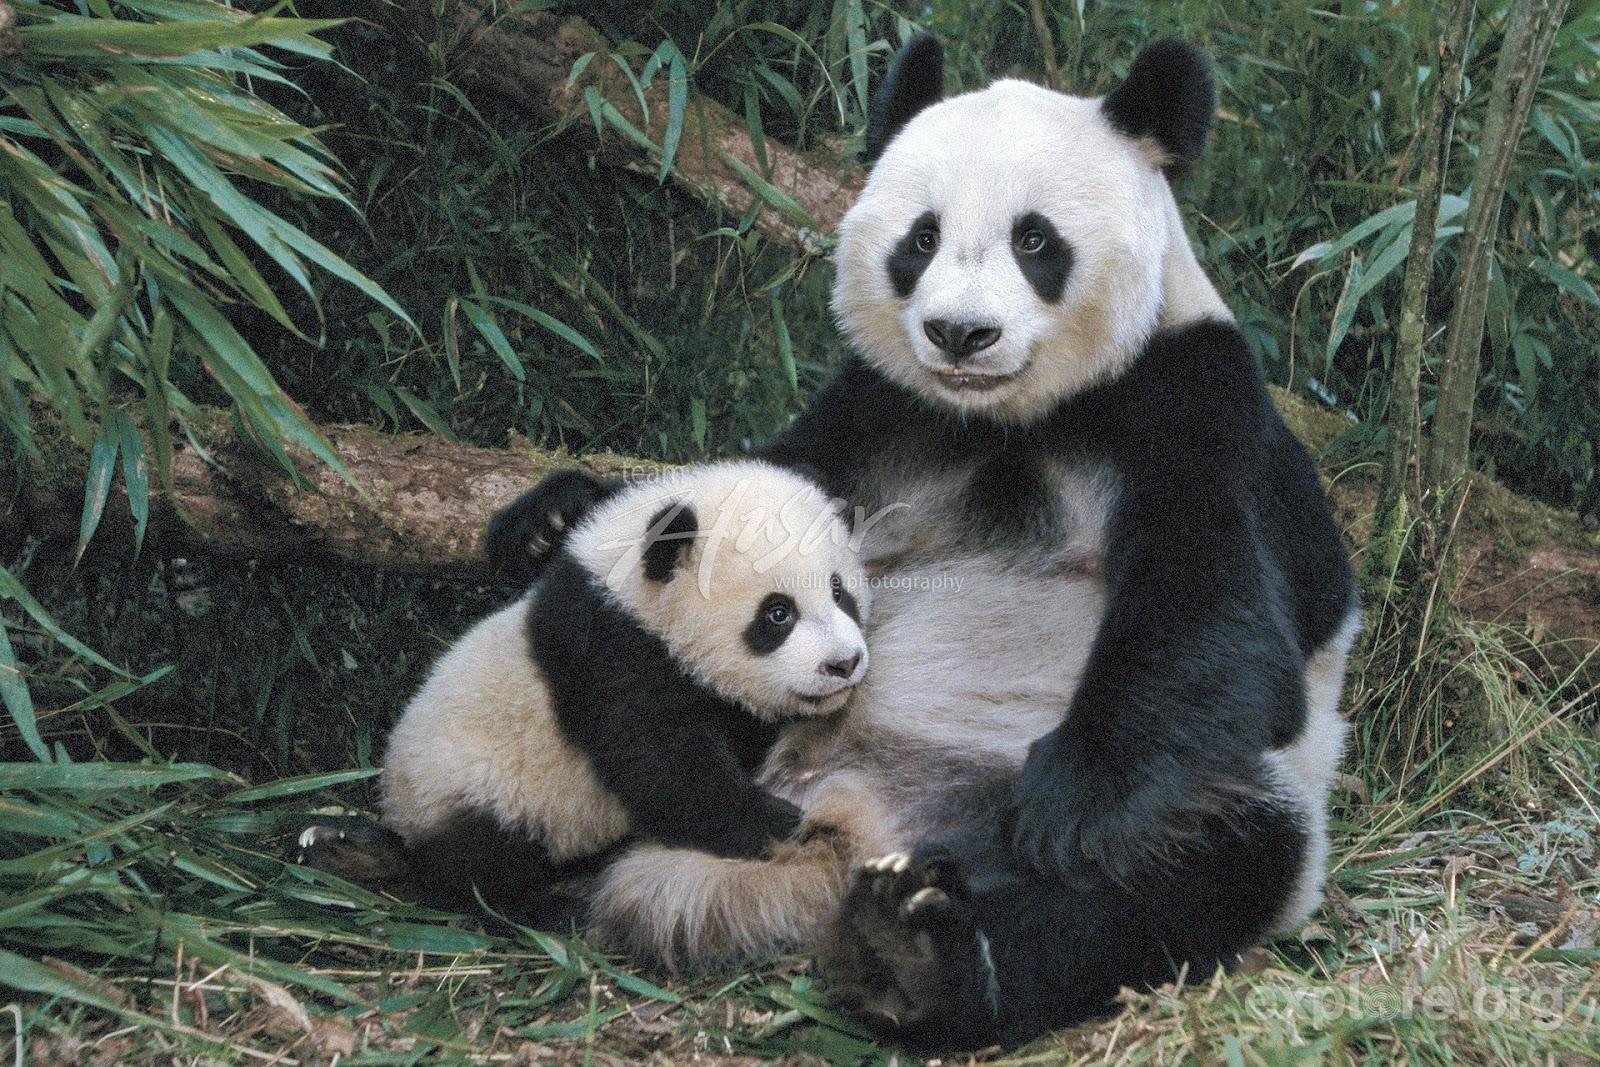 Art-ex Golden: Endangered Animals